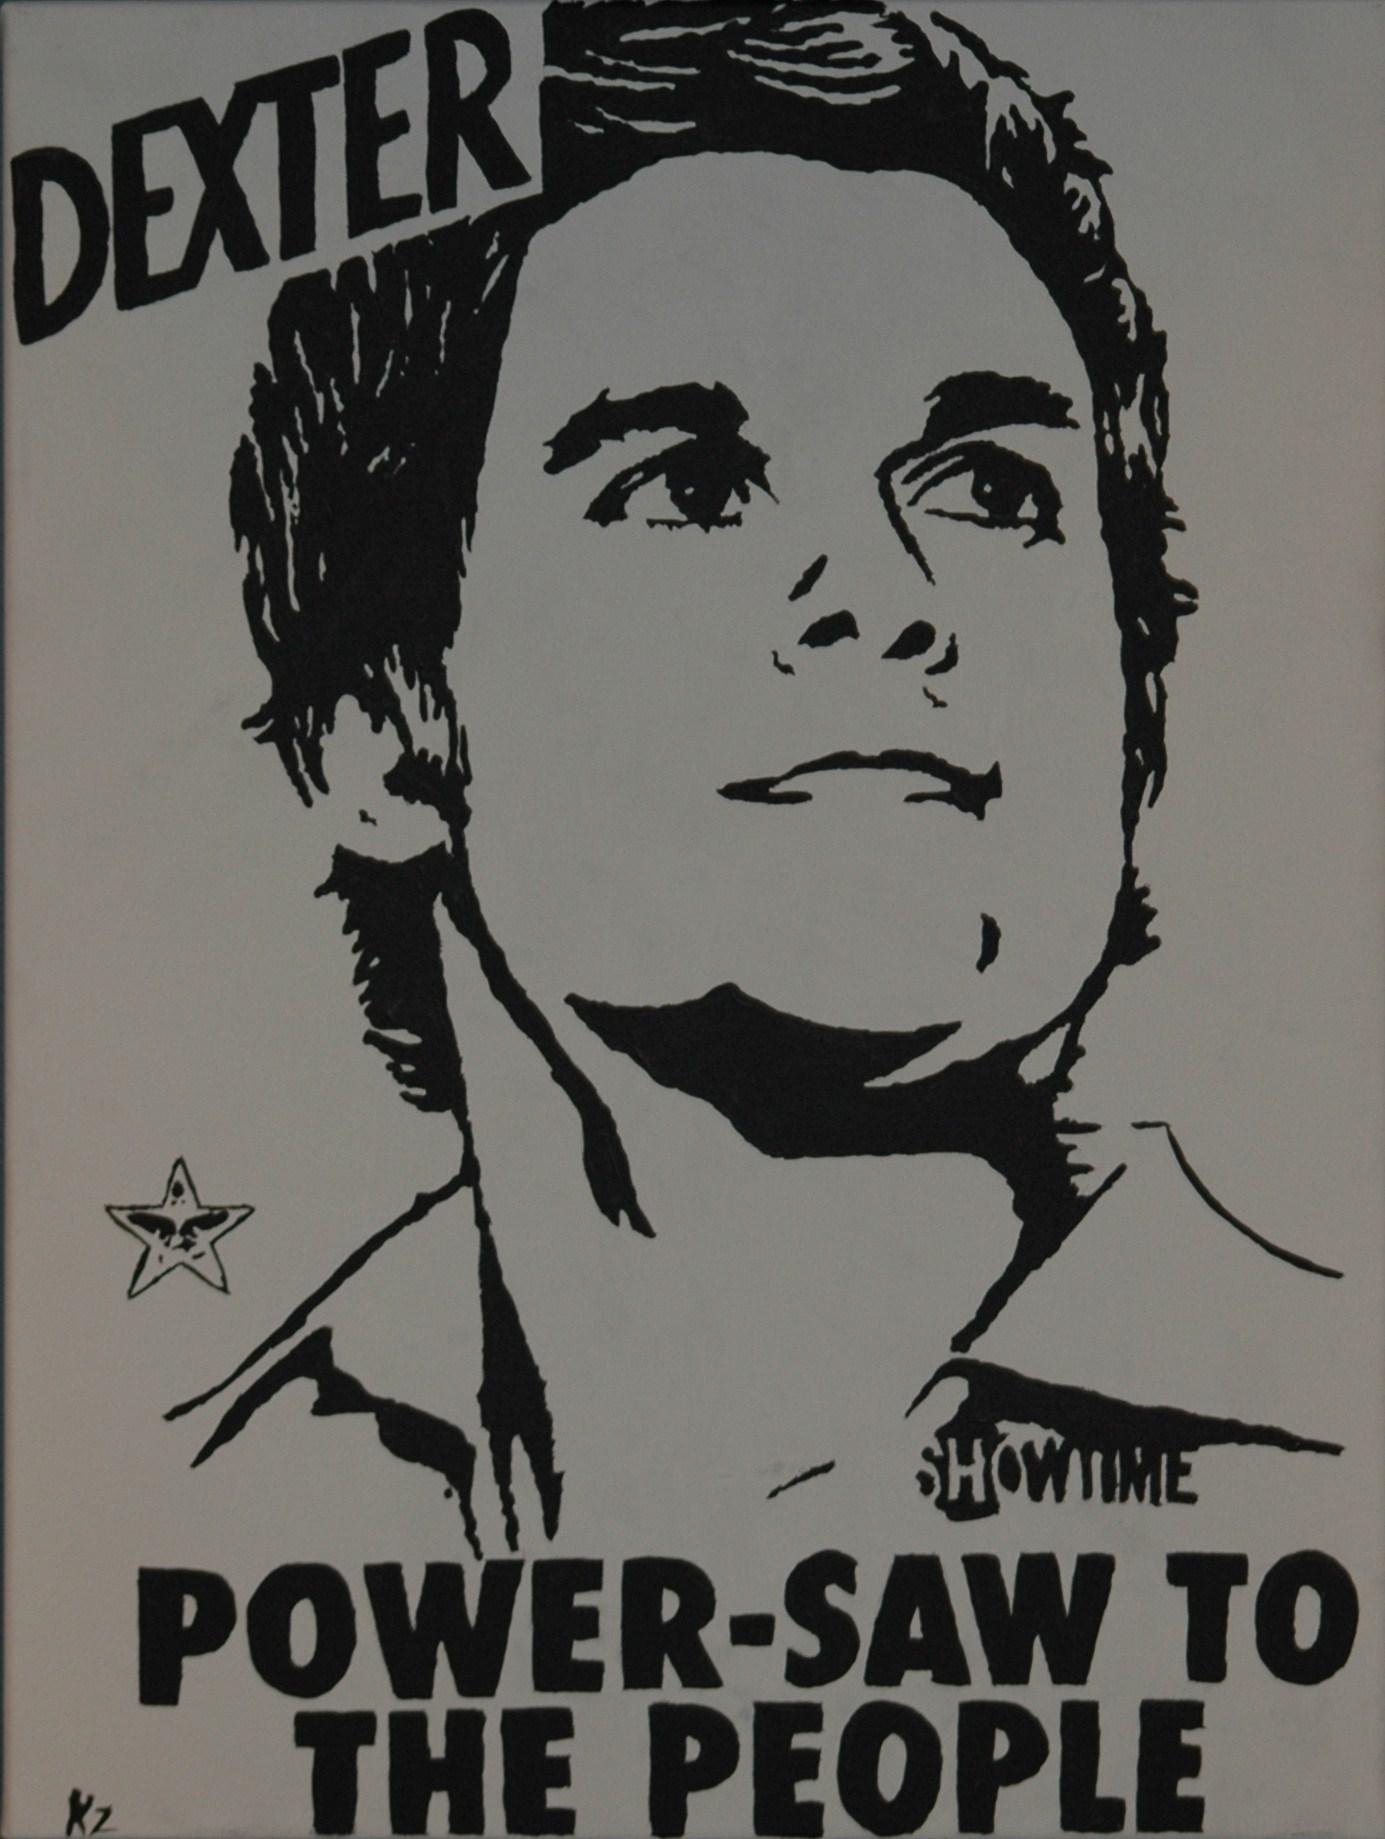 Dexter Painting